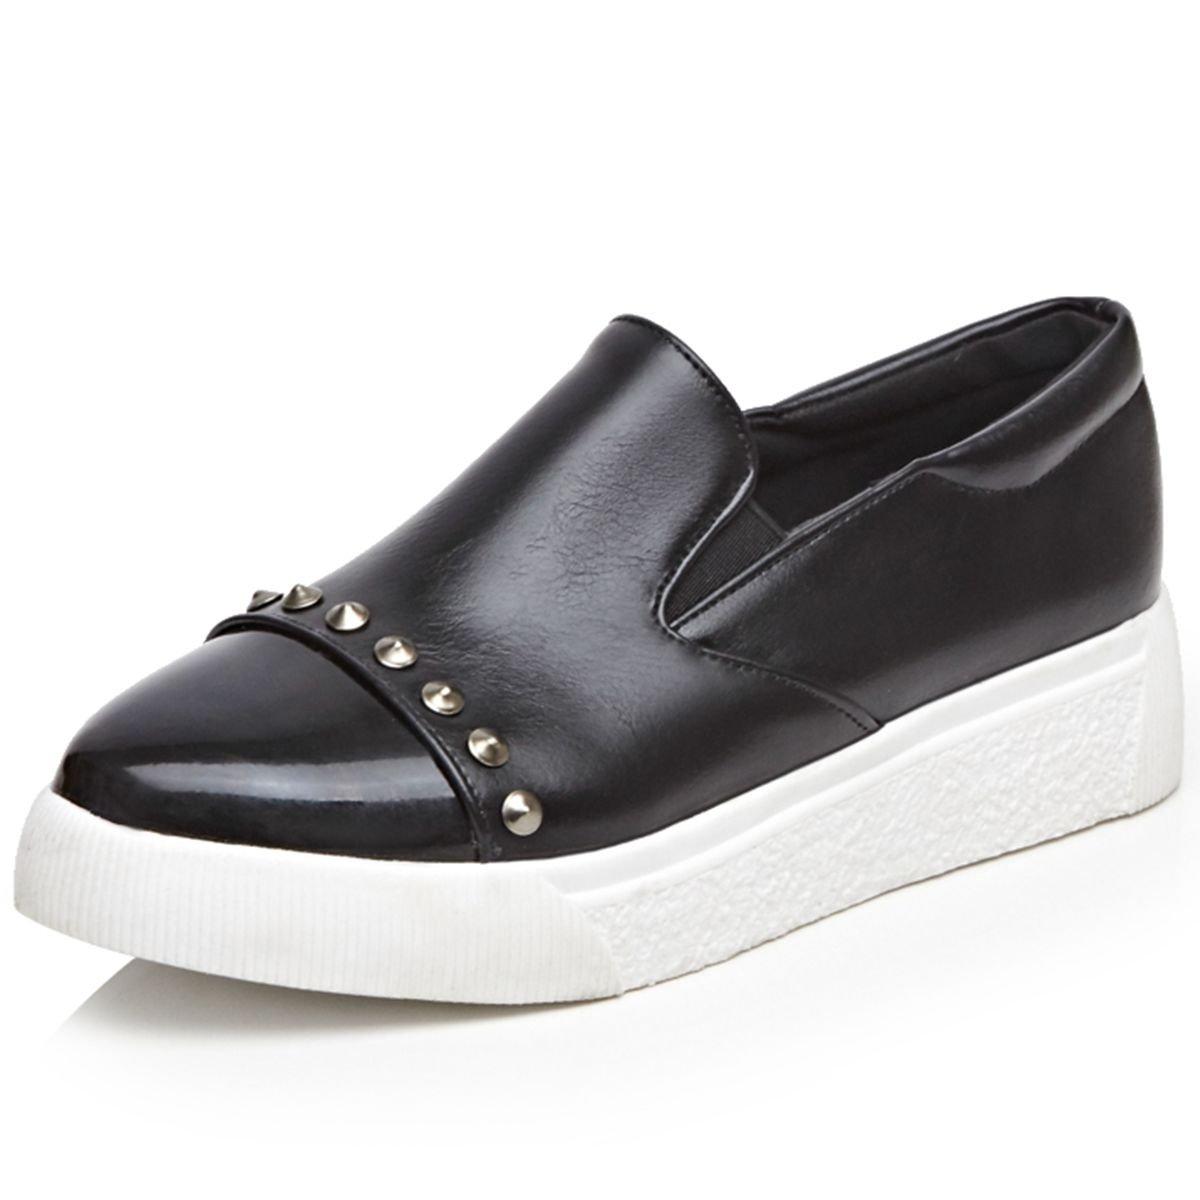 DecoStain Women's Fashion Comfort Slip On Platform Heels Sneakers Loafers Flat Dress Shoes